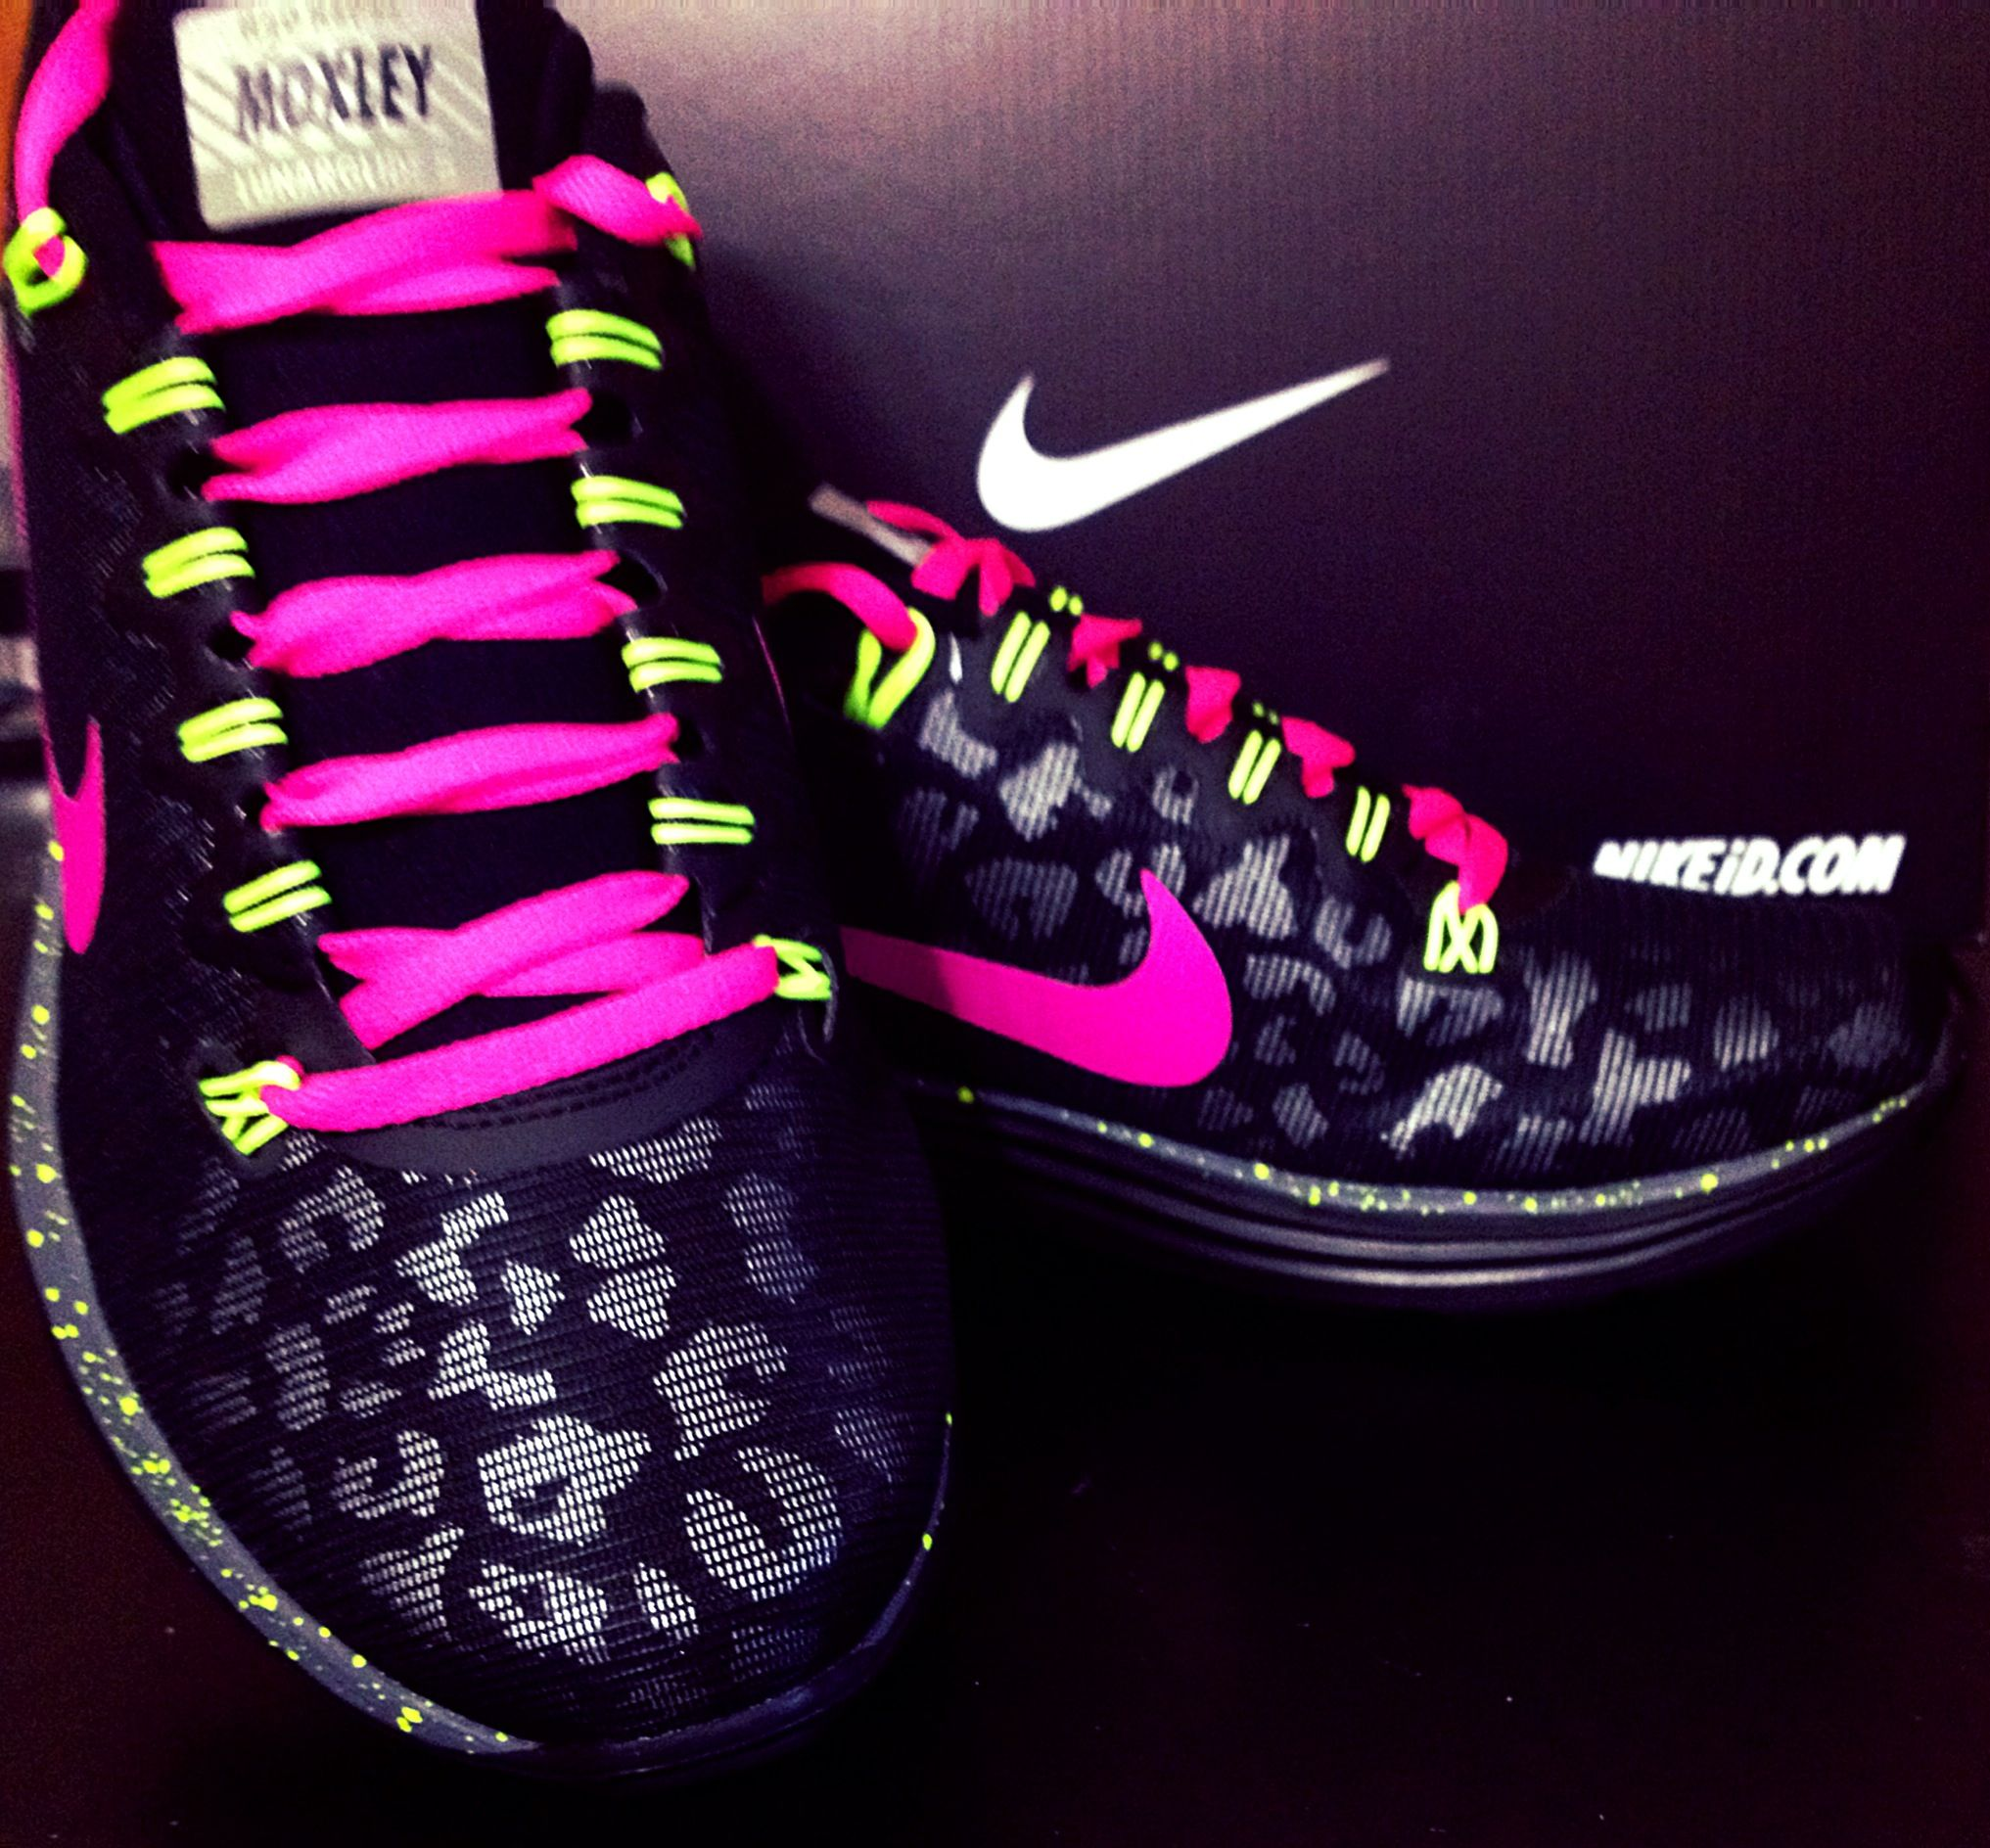 My new leopard Nike ID custom Lunarglides!